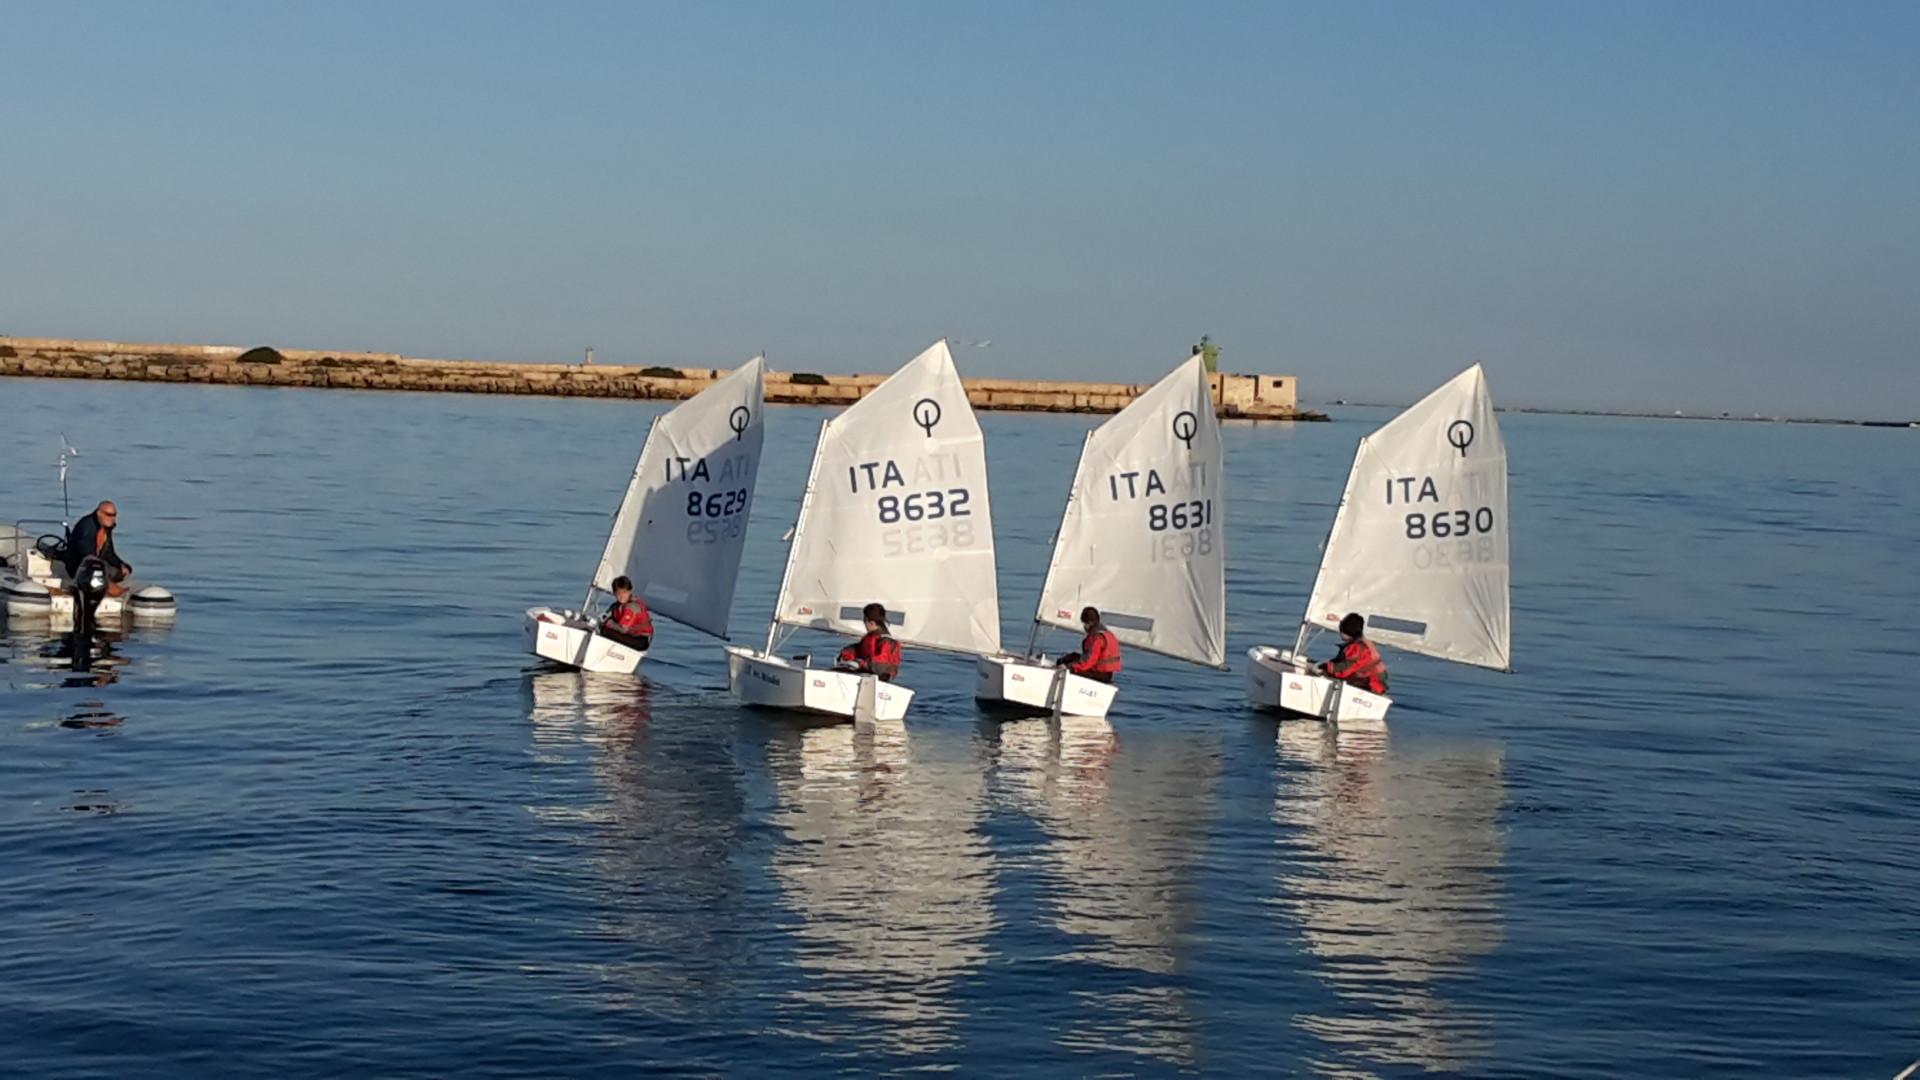 Scuola-di-vela-lega-navale-LNI-Brindisi (3)